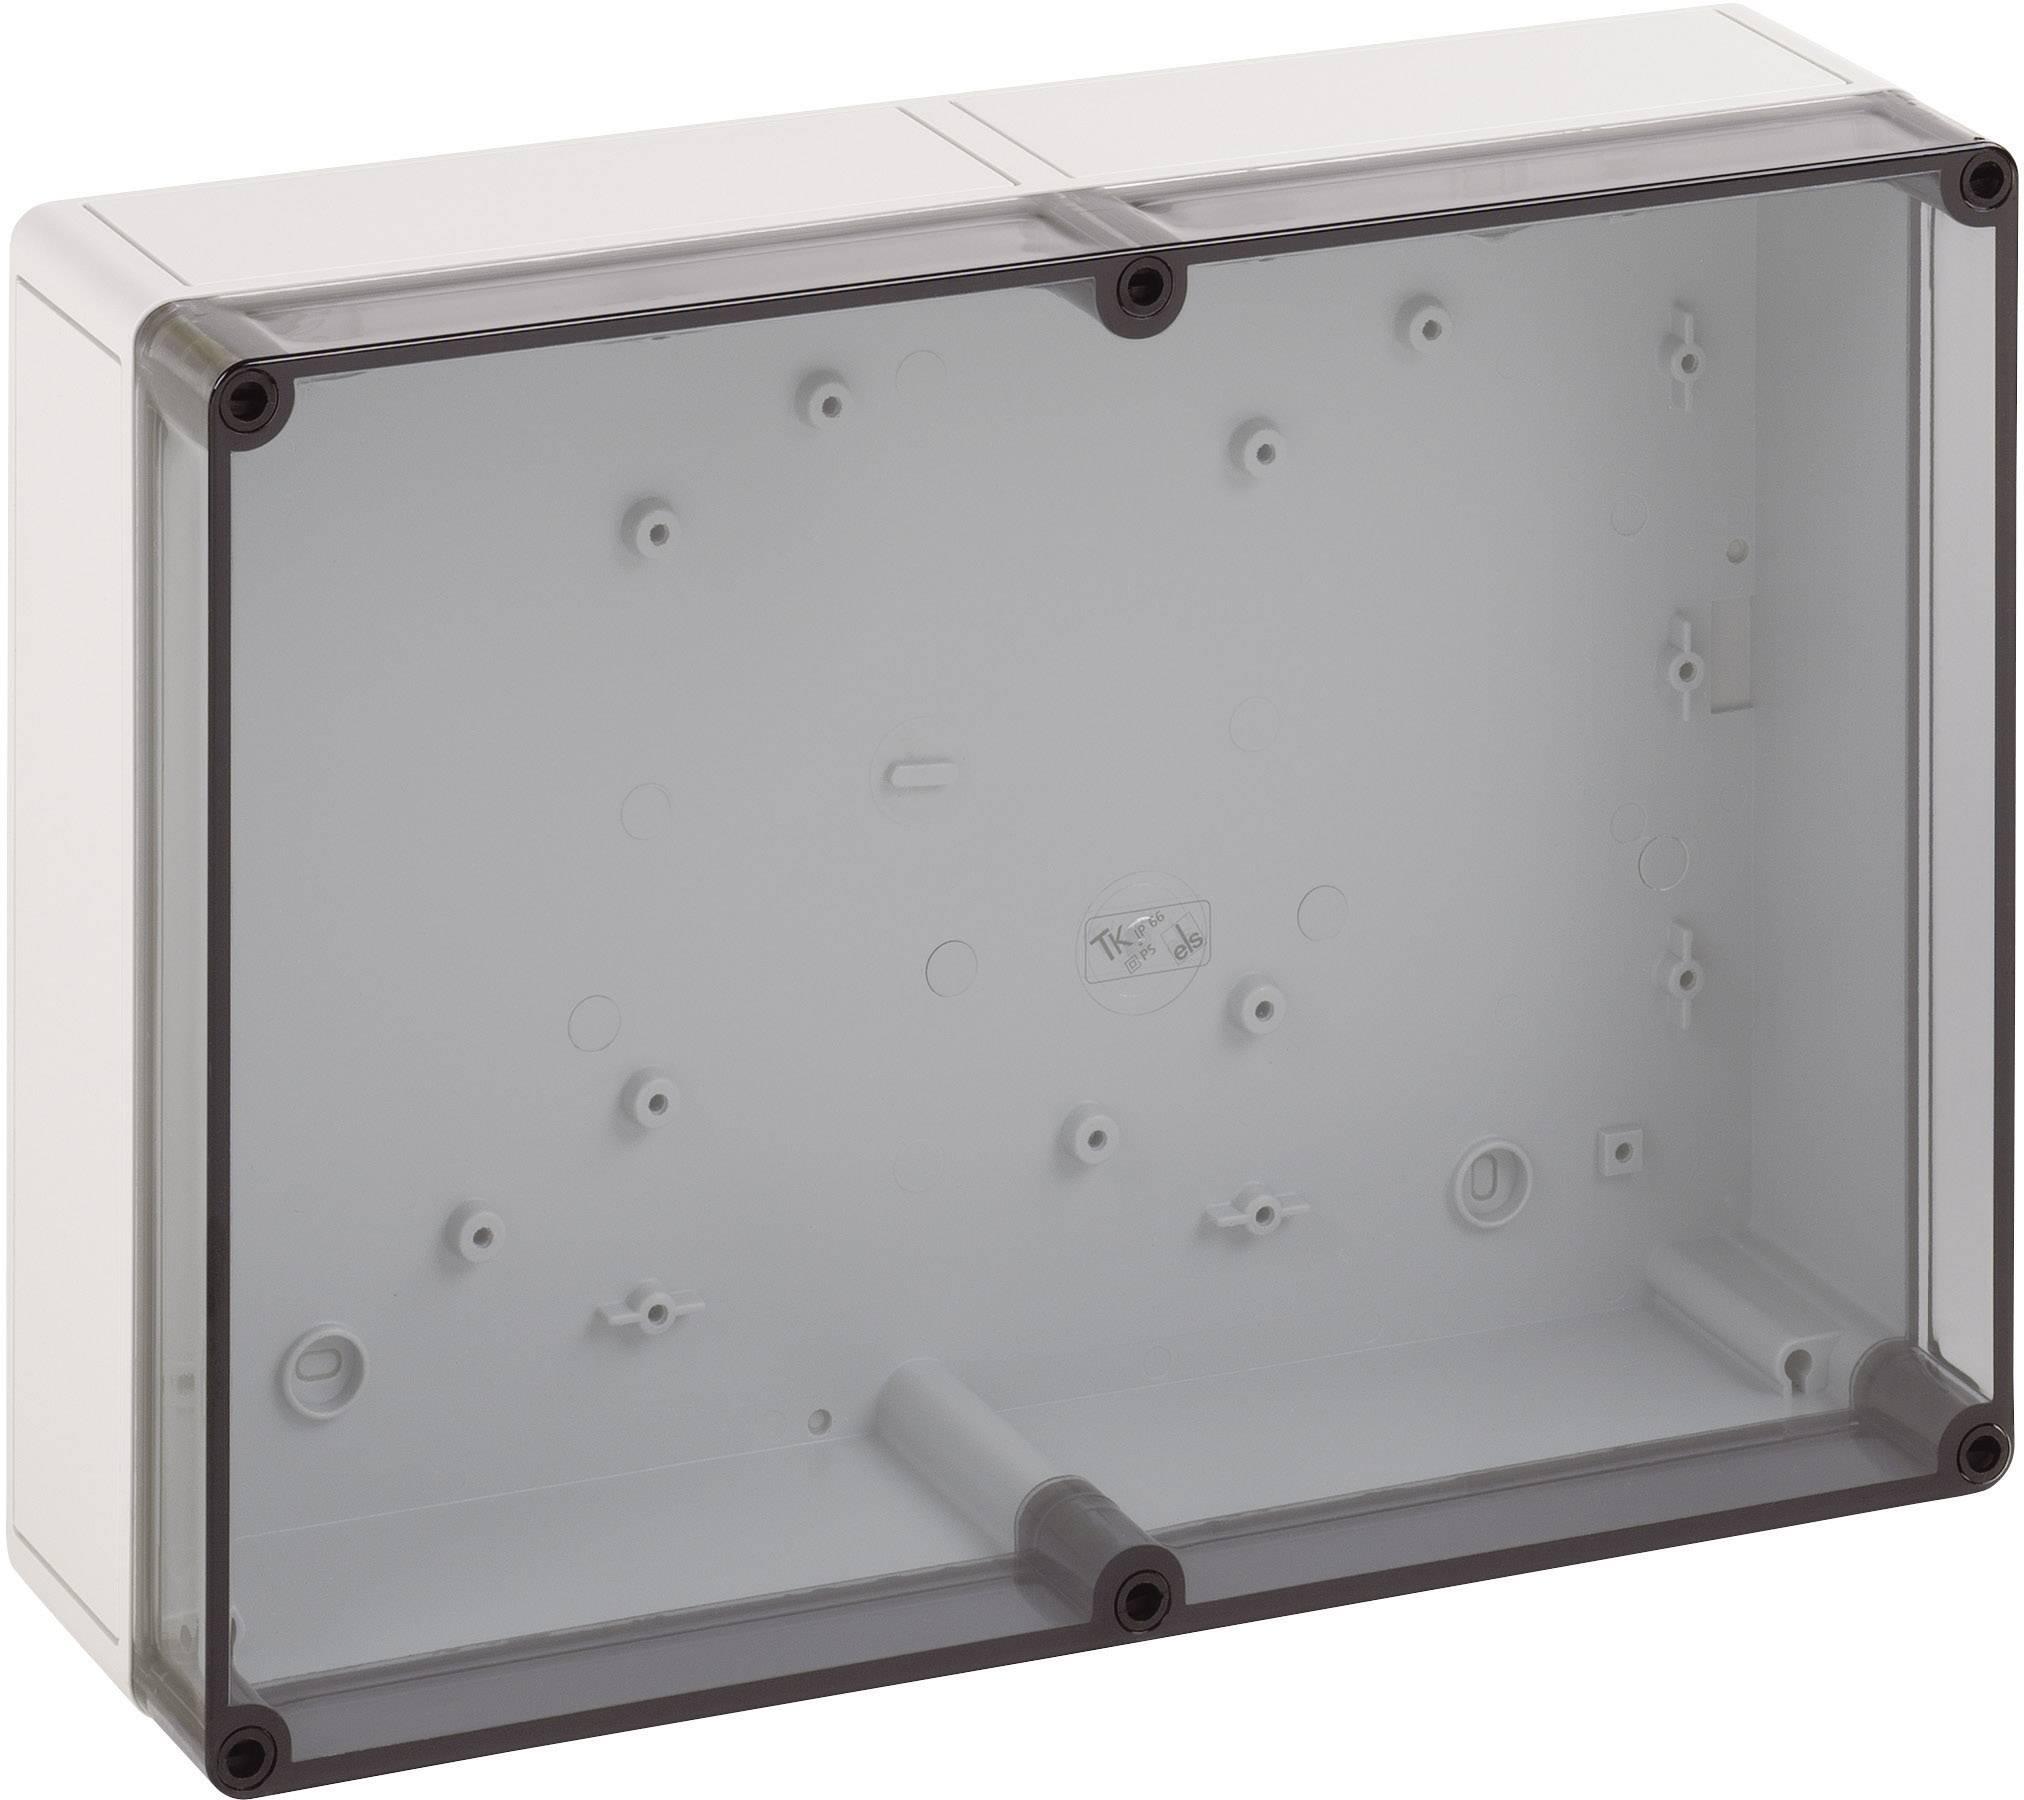 Instalační krabička Spelsberg TK PS 2518-8f-t, (d x š x v) 254 x 180 x 84 mm, polykarbonát, polystyren (EPS), šedá, 1 ks